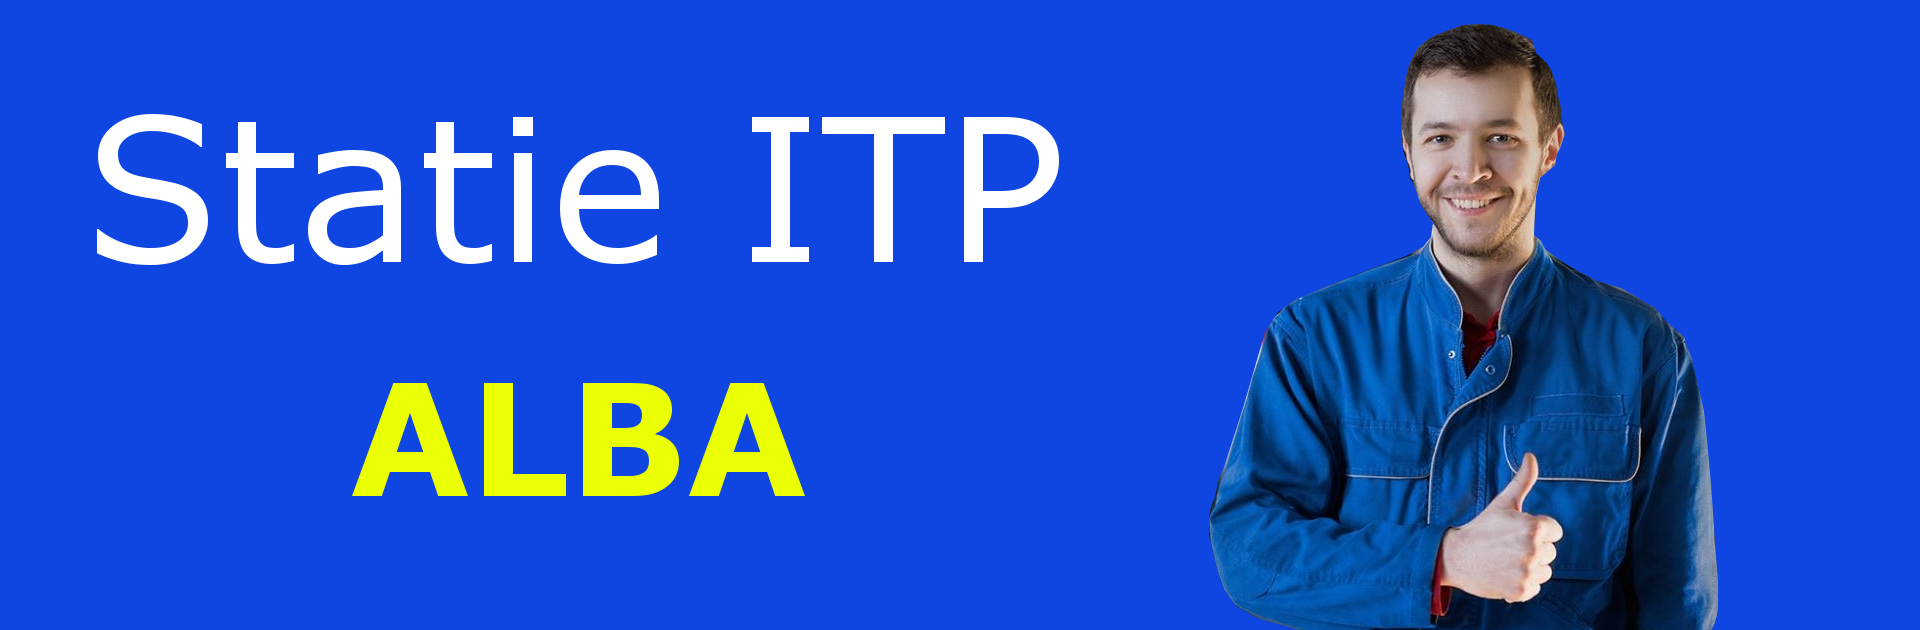 Banner ITP ALBA